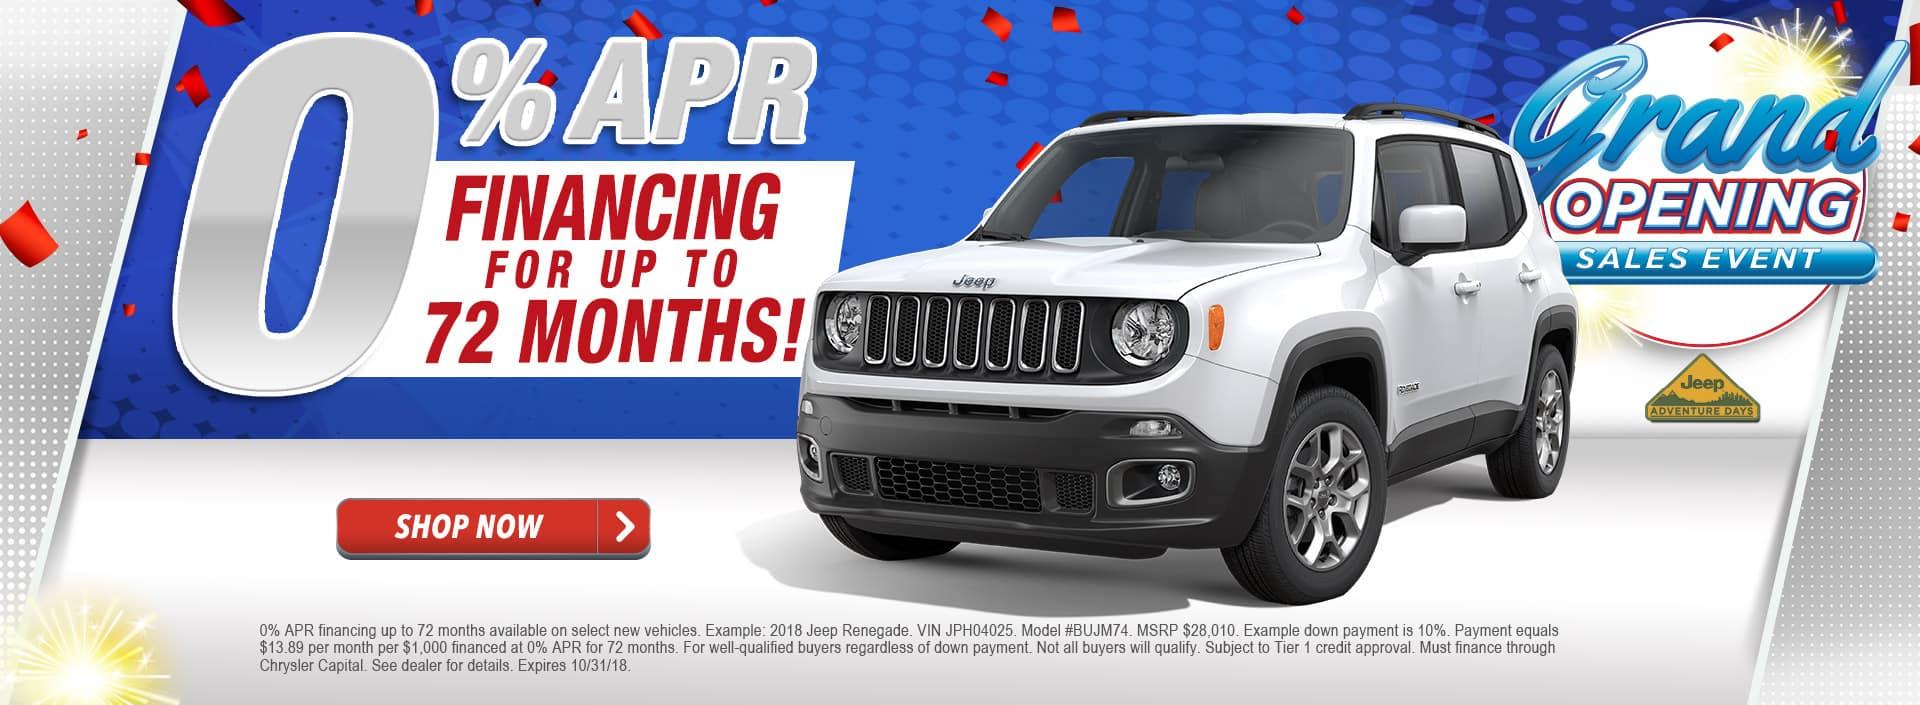 Stateline Chrysler Jeep Dodge Ram